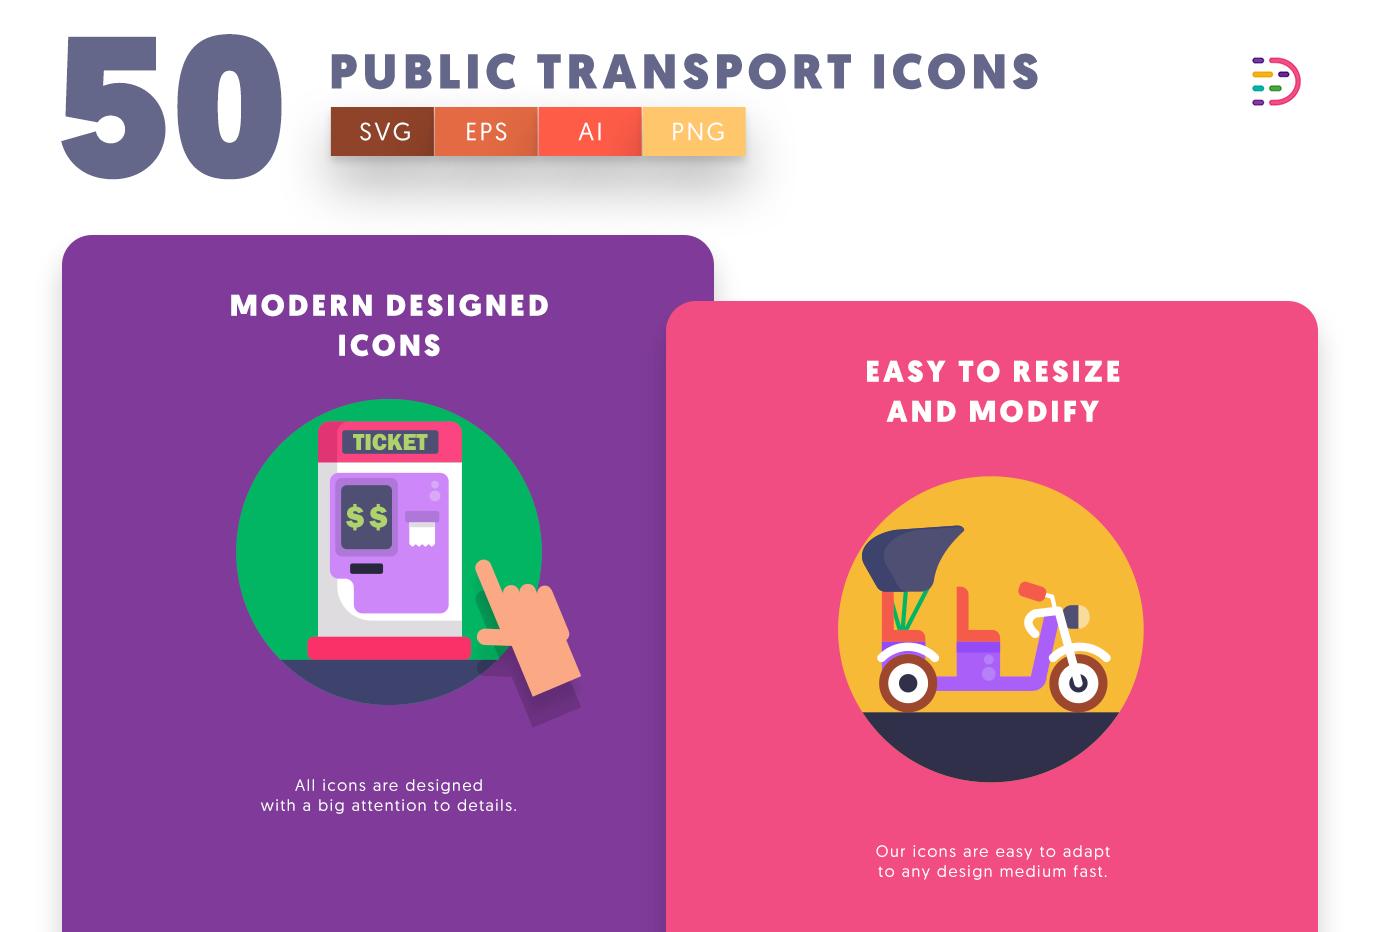 Public Transport icons png/svg/eps